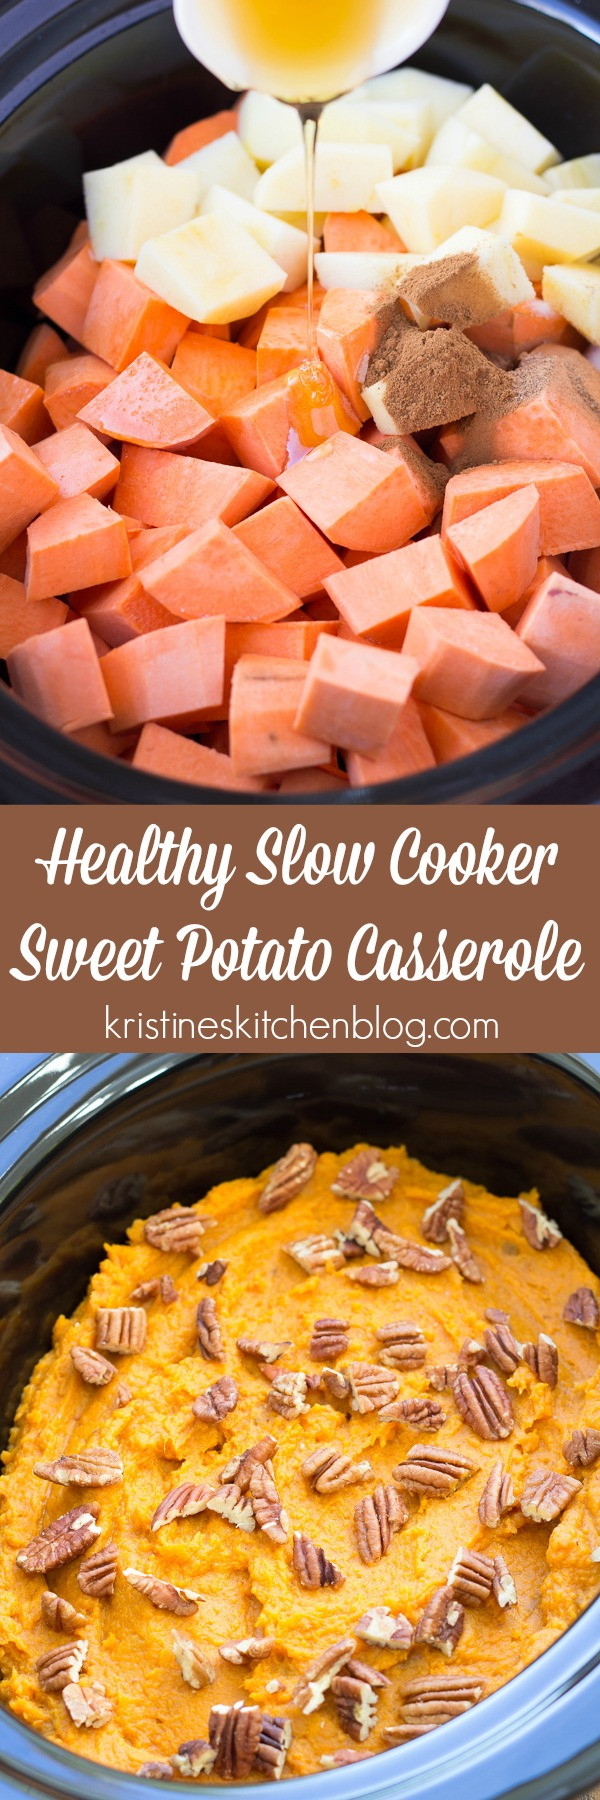 Slow Cooker Sweet Potato Recipes Healthy  Healthy Slow Cooker Sweet Potato Casserole Kristine s